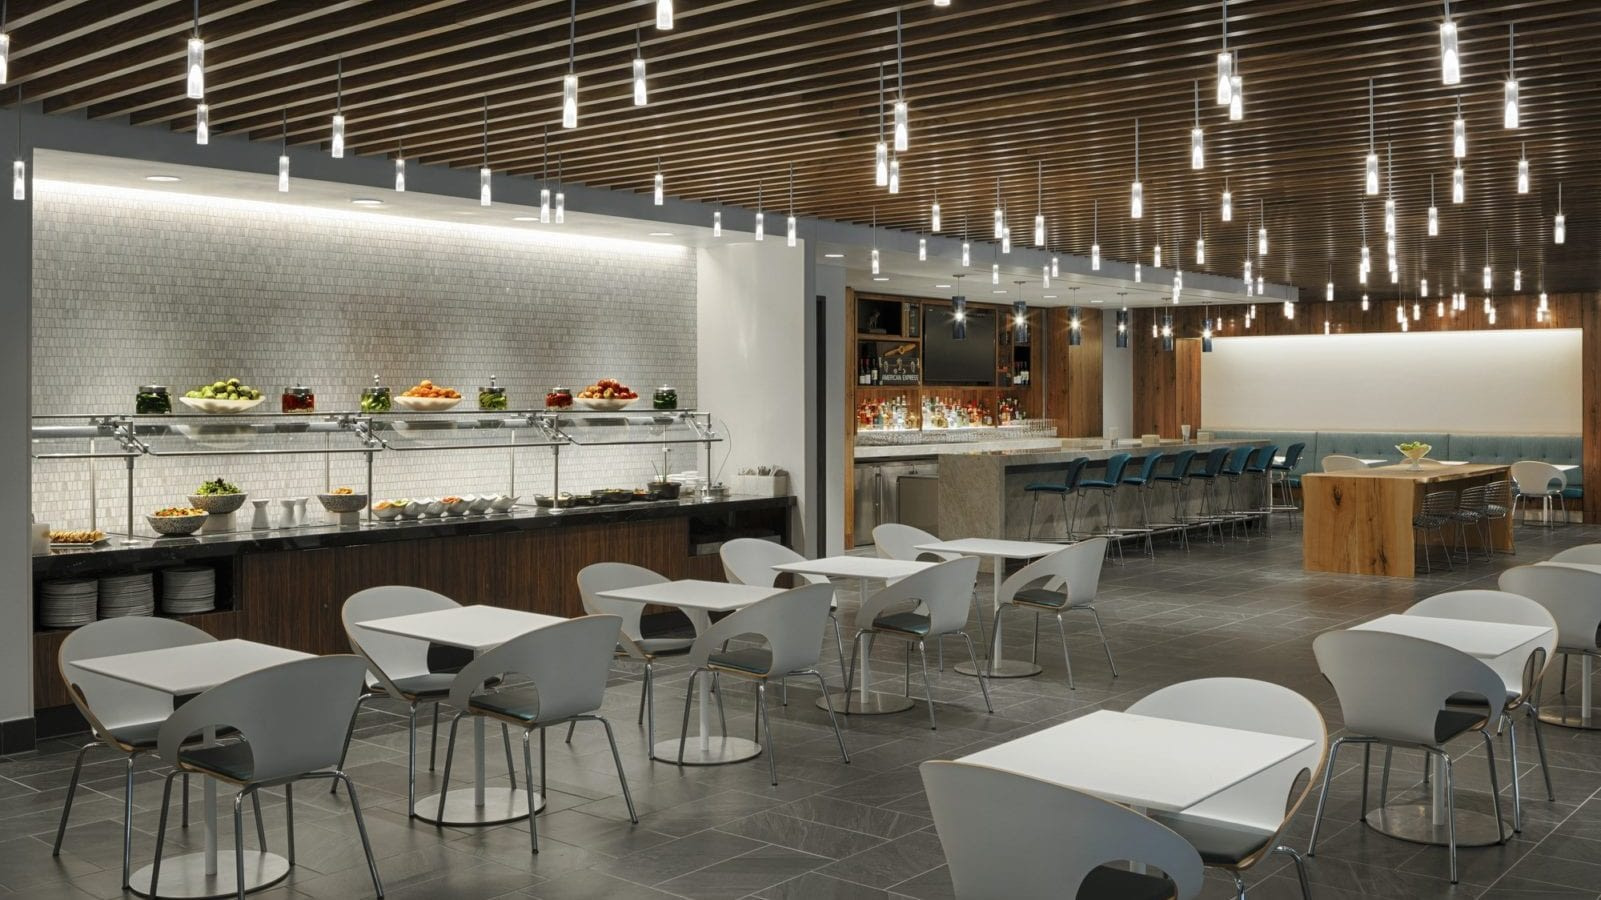 The American Express Centurion Lounge benefits from an abundance of natural light.